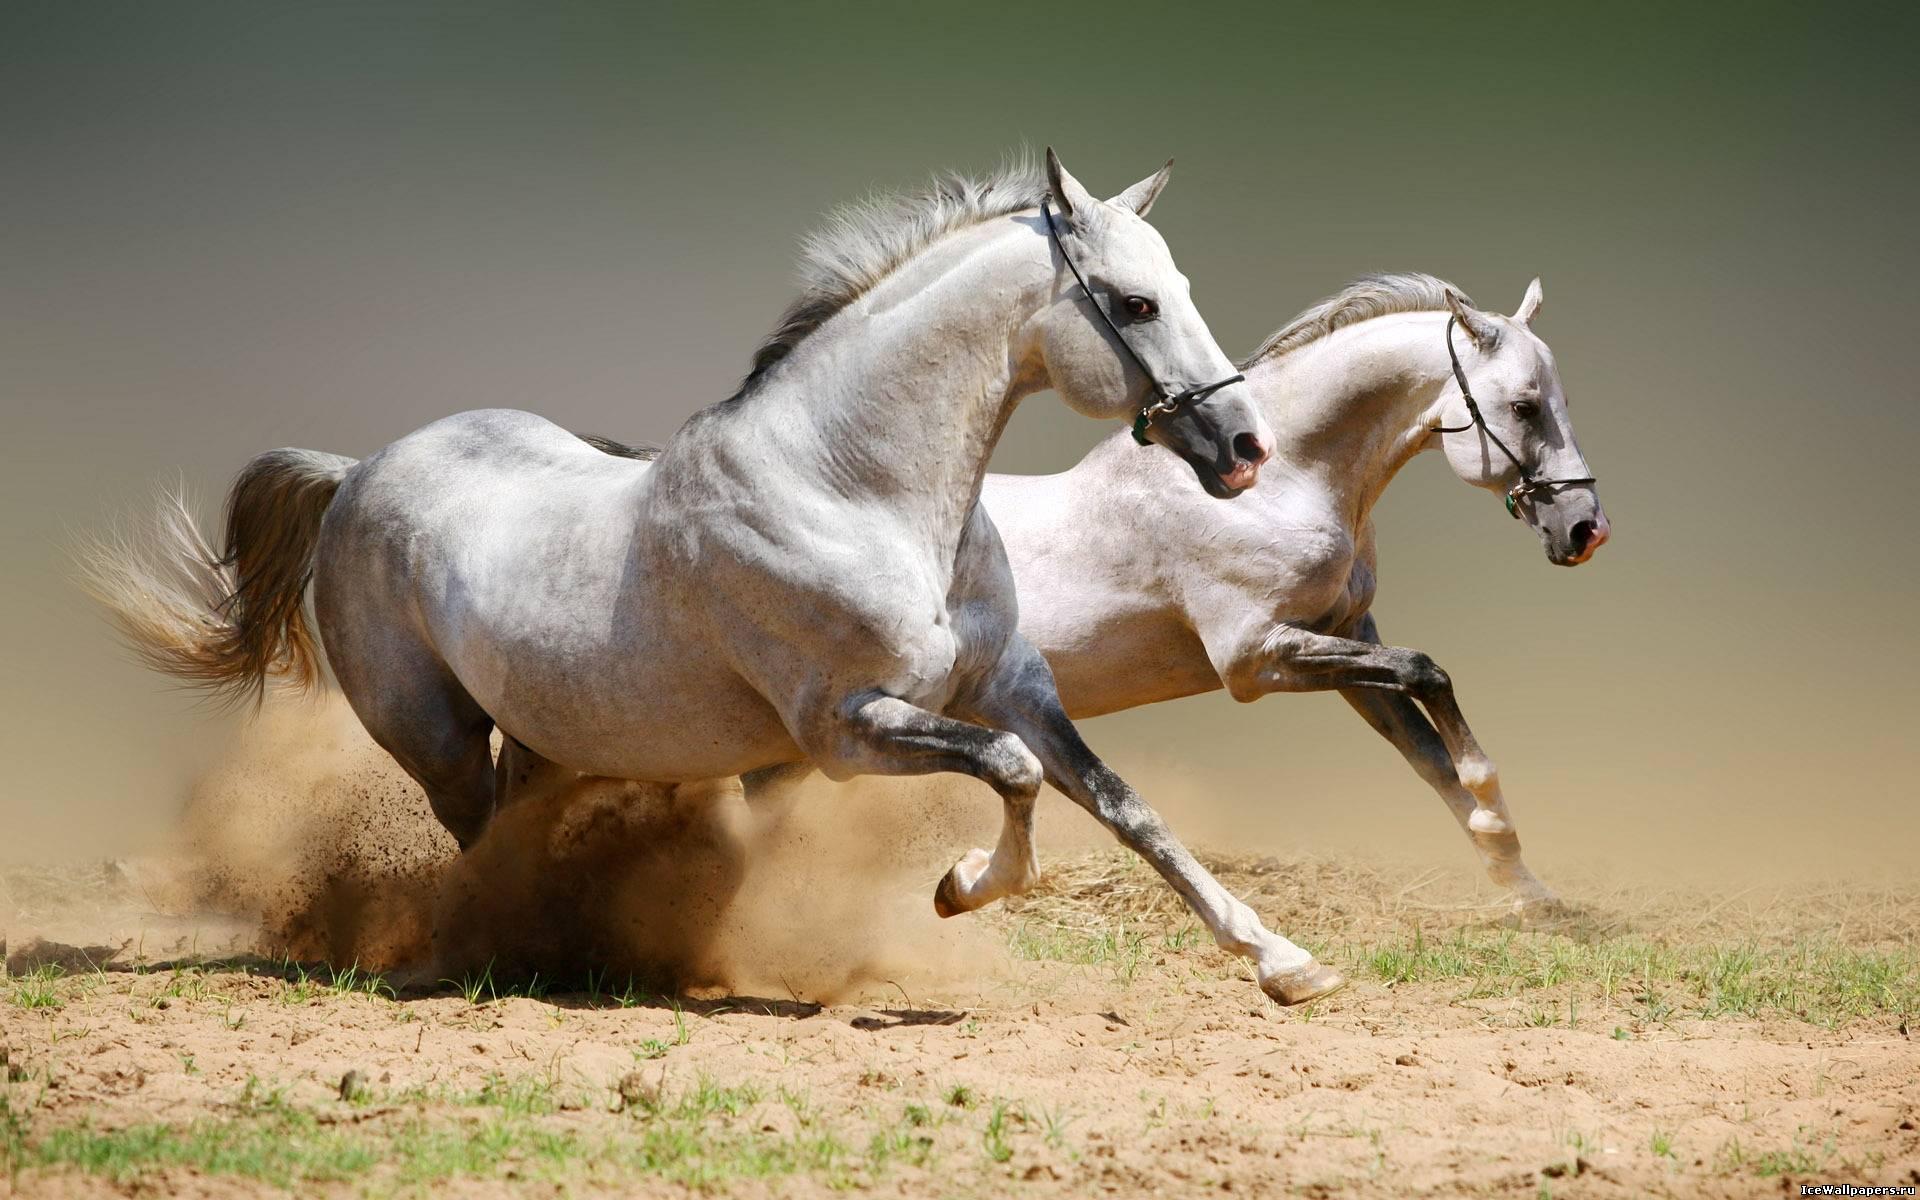 ... Животные » Картинки 24 - скачать: www.kartinki24.ru/kartinki/horses/3035-kartinka-17.html